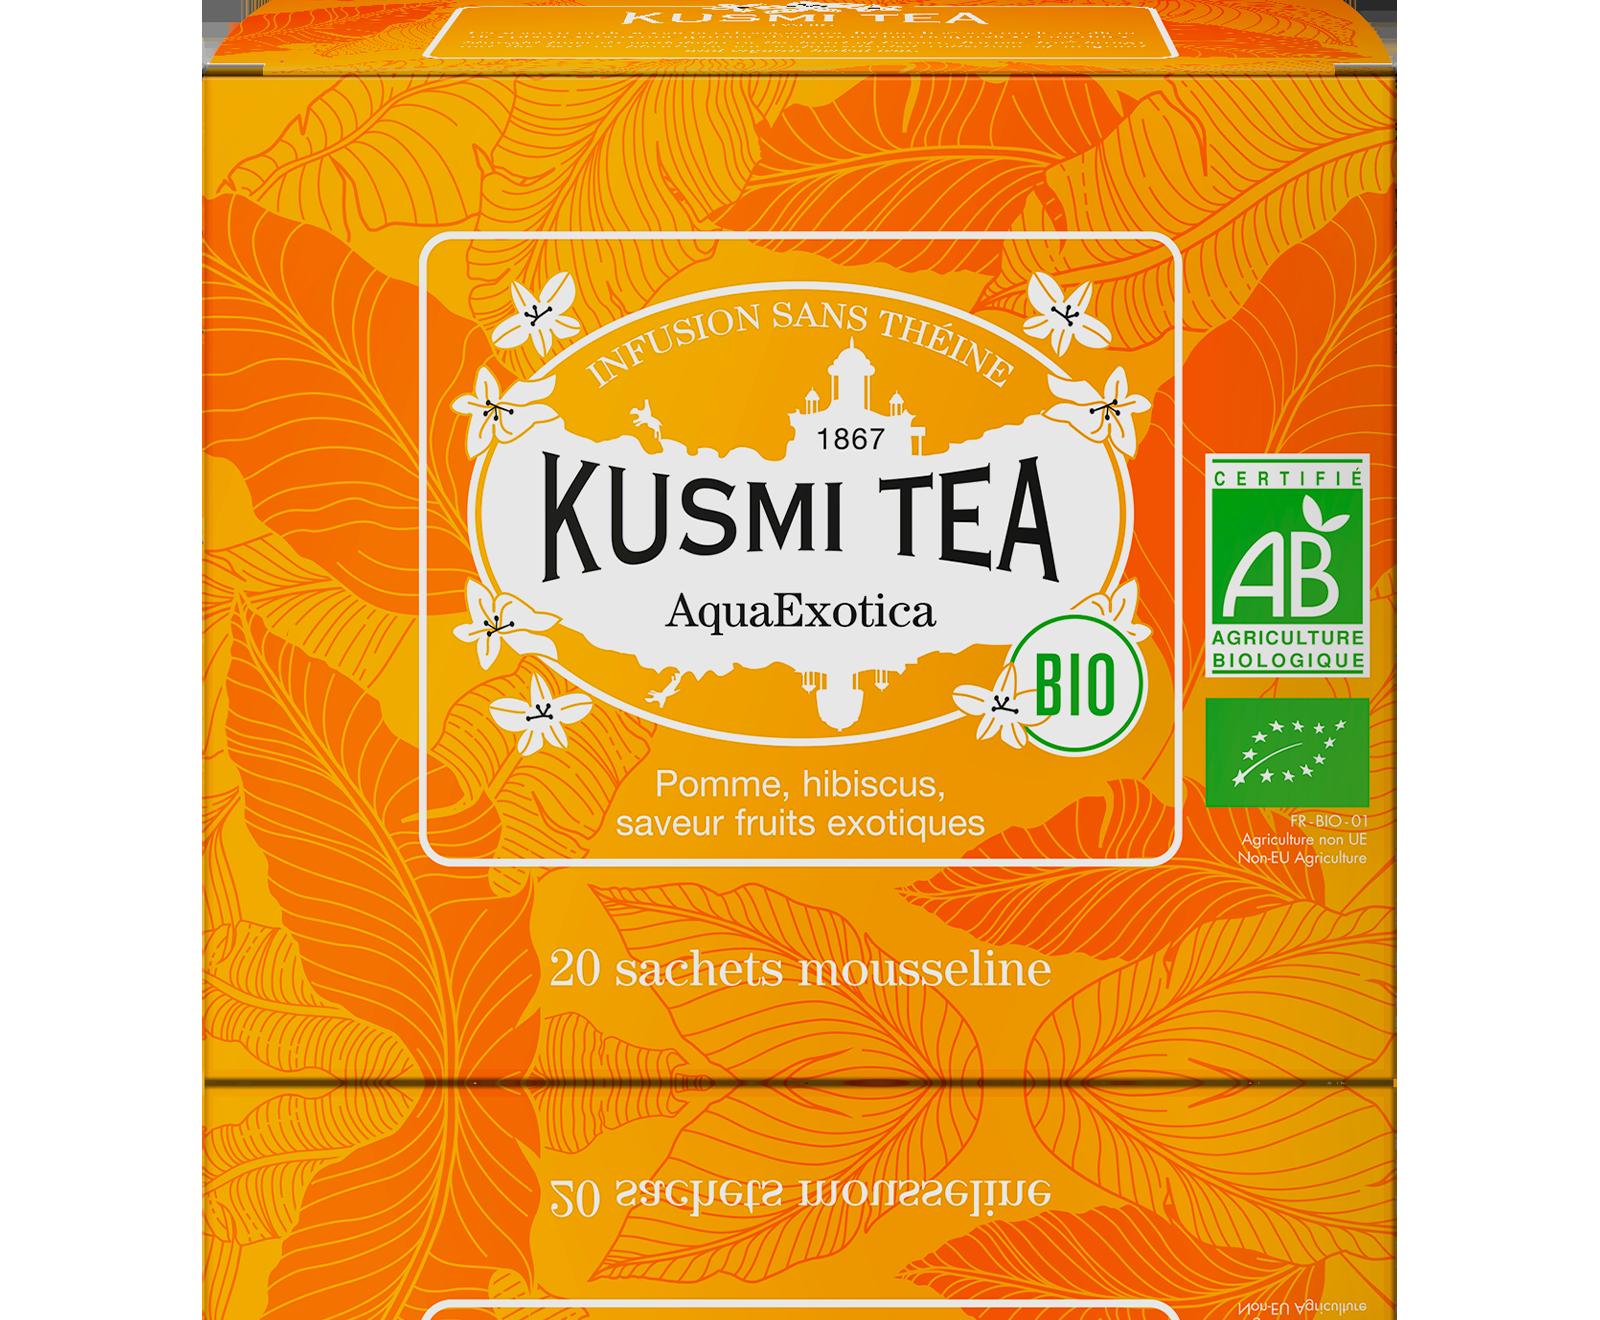 Infusion d'hibiscus bio - AquaExotica (Infusion de fruits bio) - Sachets - Kusmi Tea